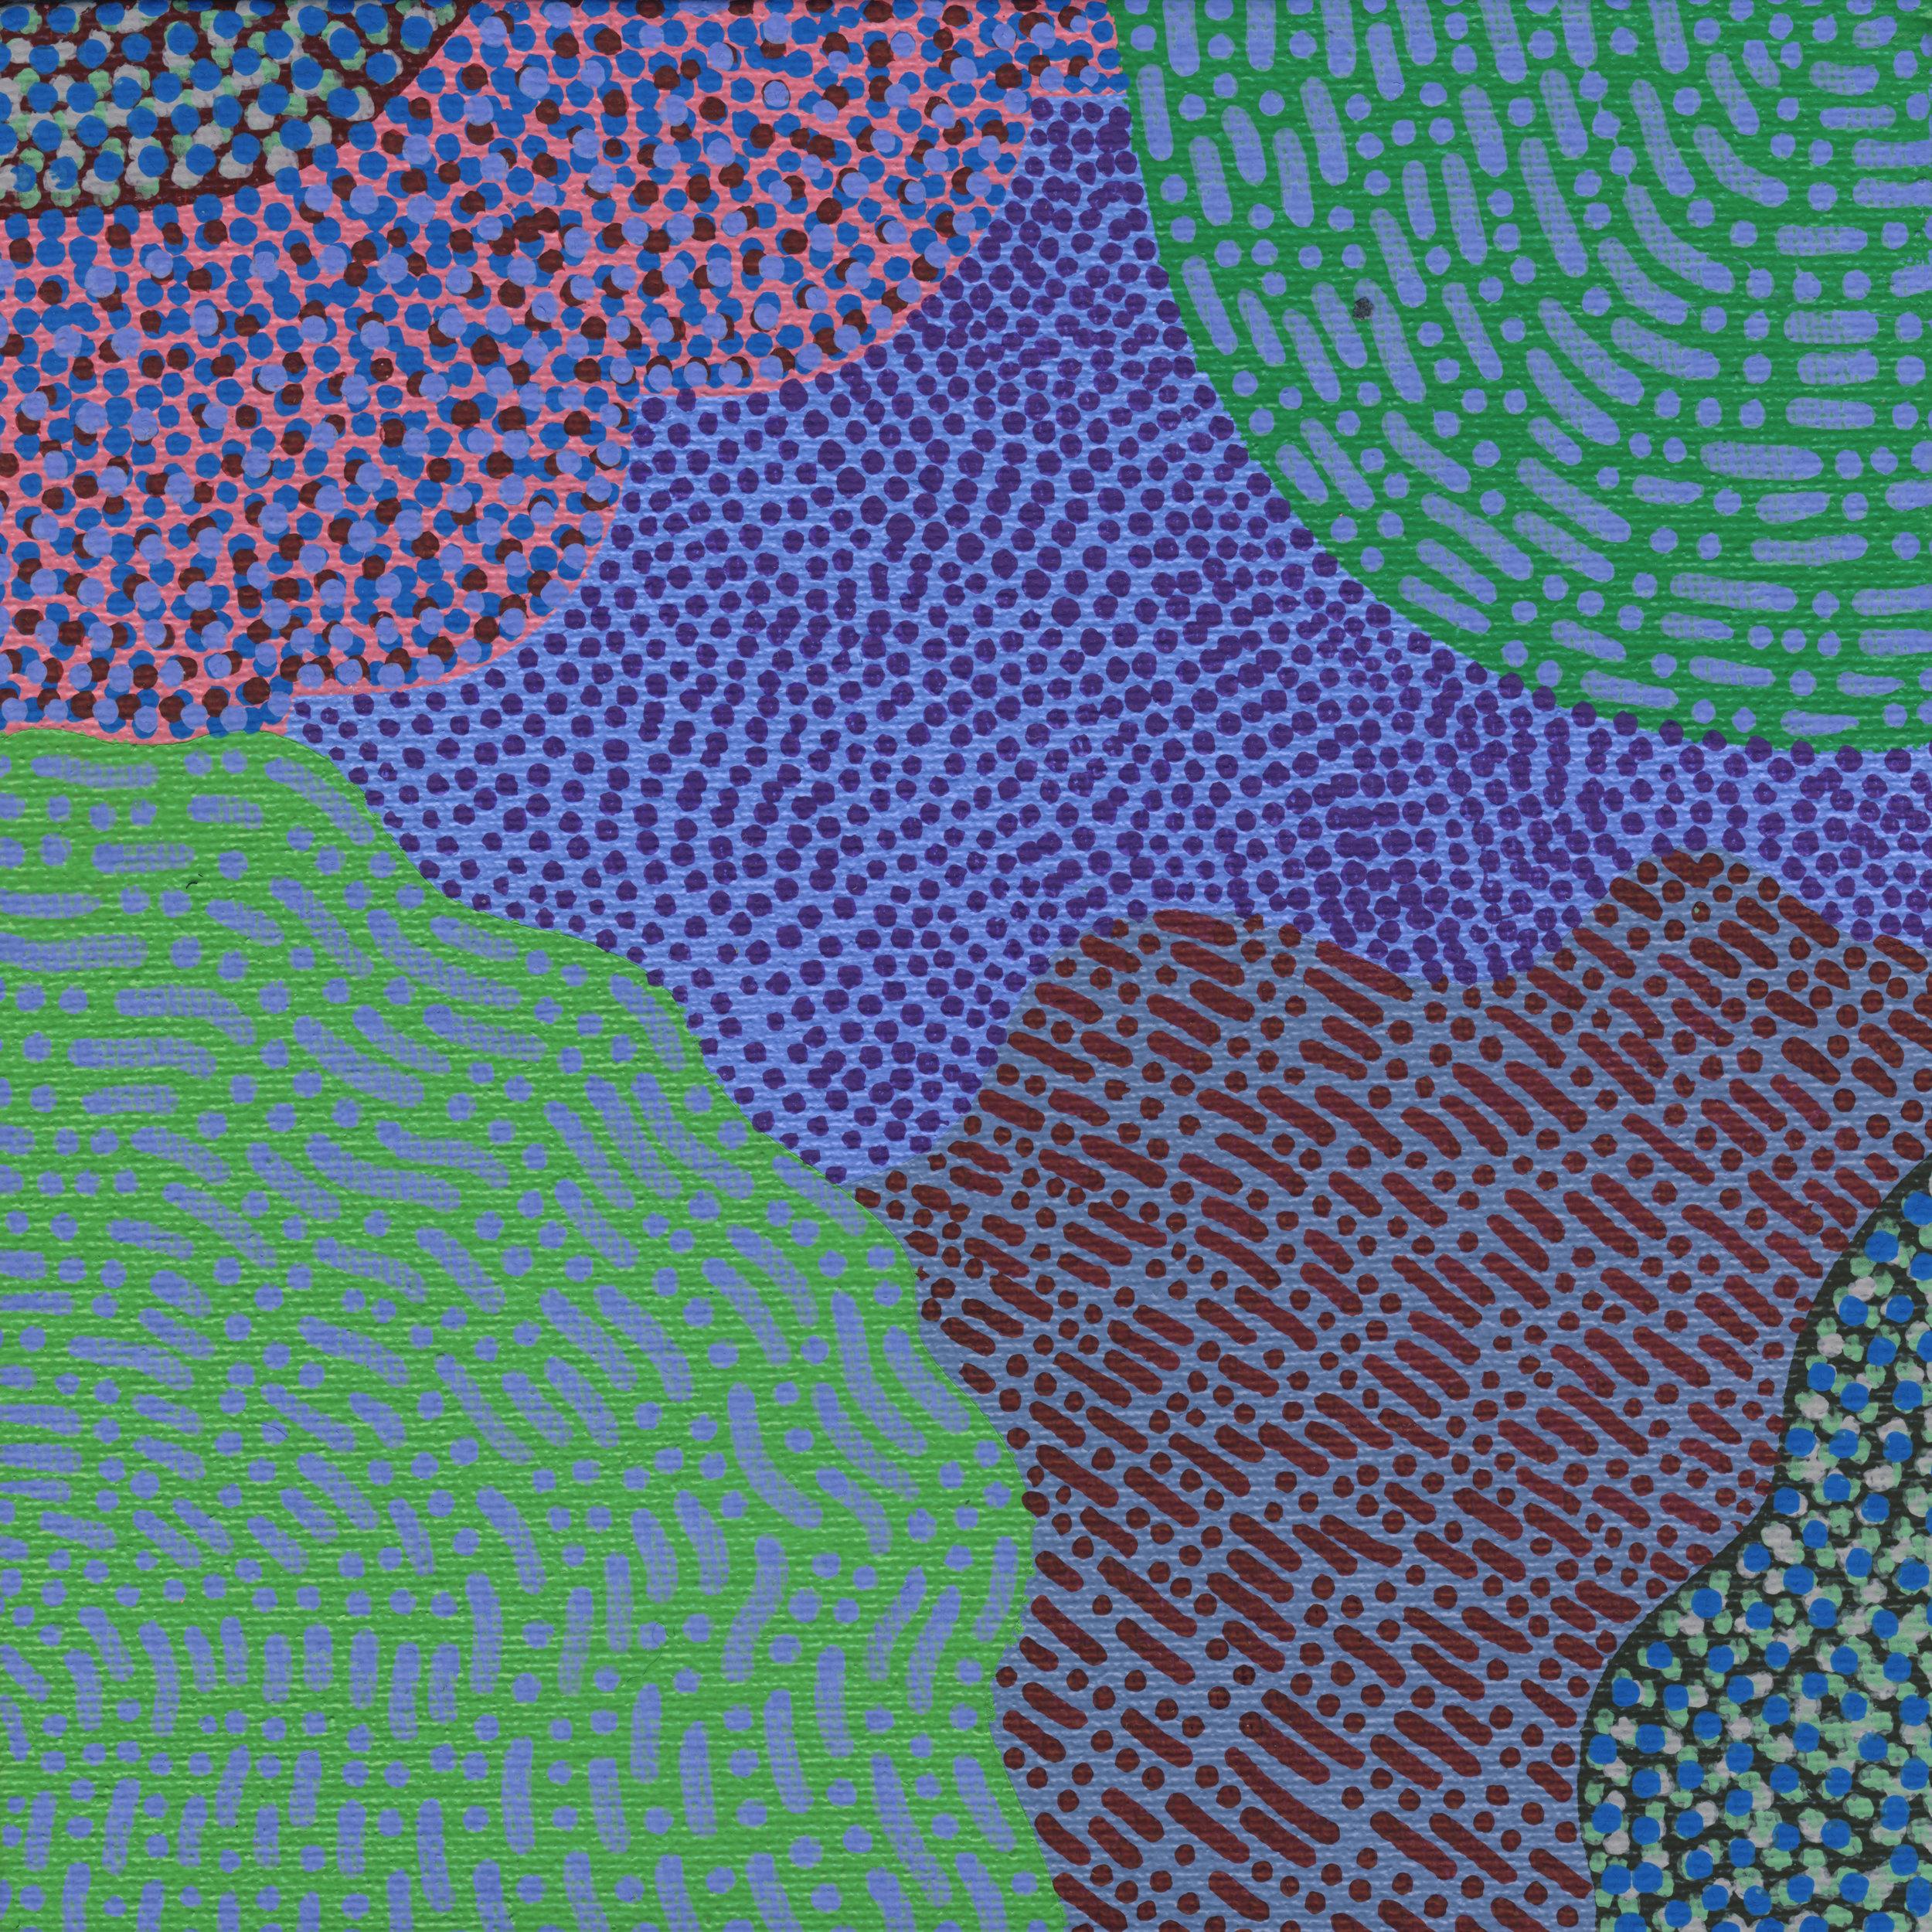 "99/100, Acrylic on canvas panel, 6"" X 6"", 4/15/19"